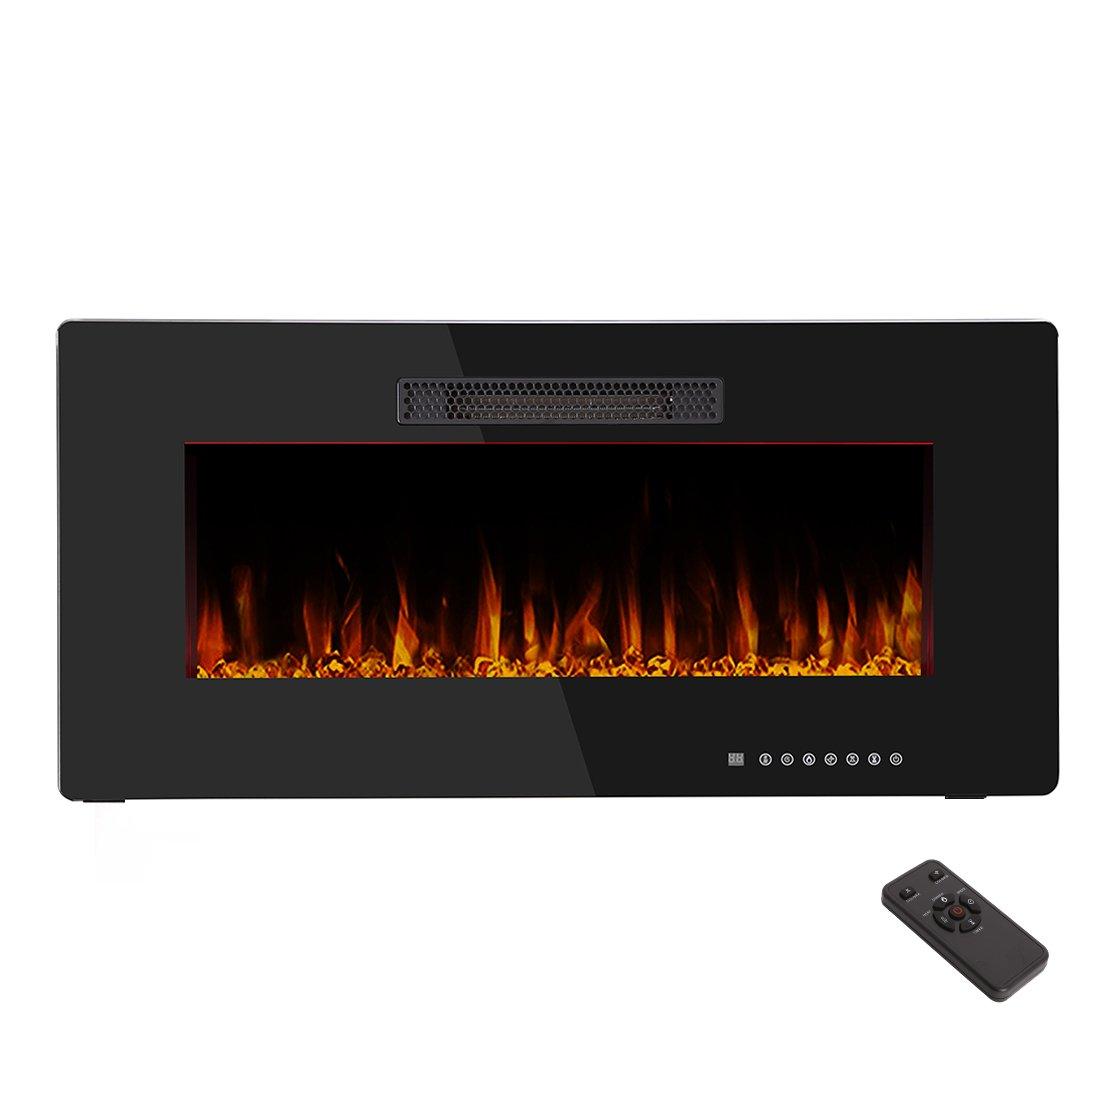 R.W.FLAME 36'' Electric Fireplace Heater,Wall Mounted & In-wall Recessed Fireplace Heater Flat Panel,Adjustable with Remote Control,750W-1500W,Black, 1 Years Warranty